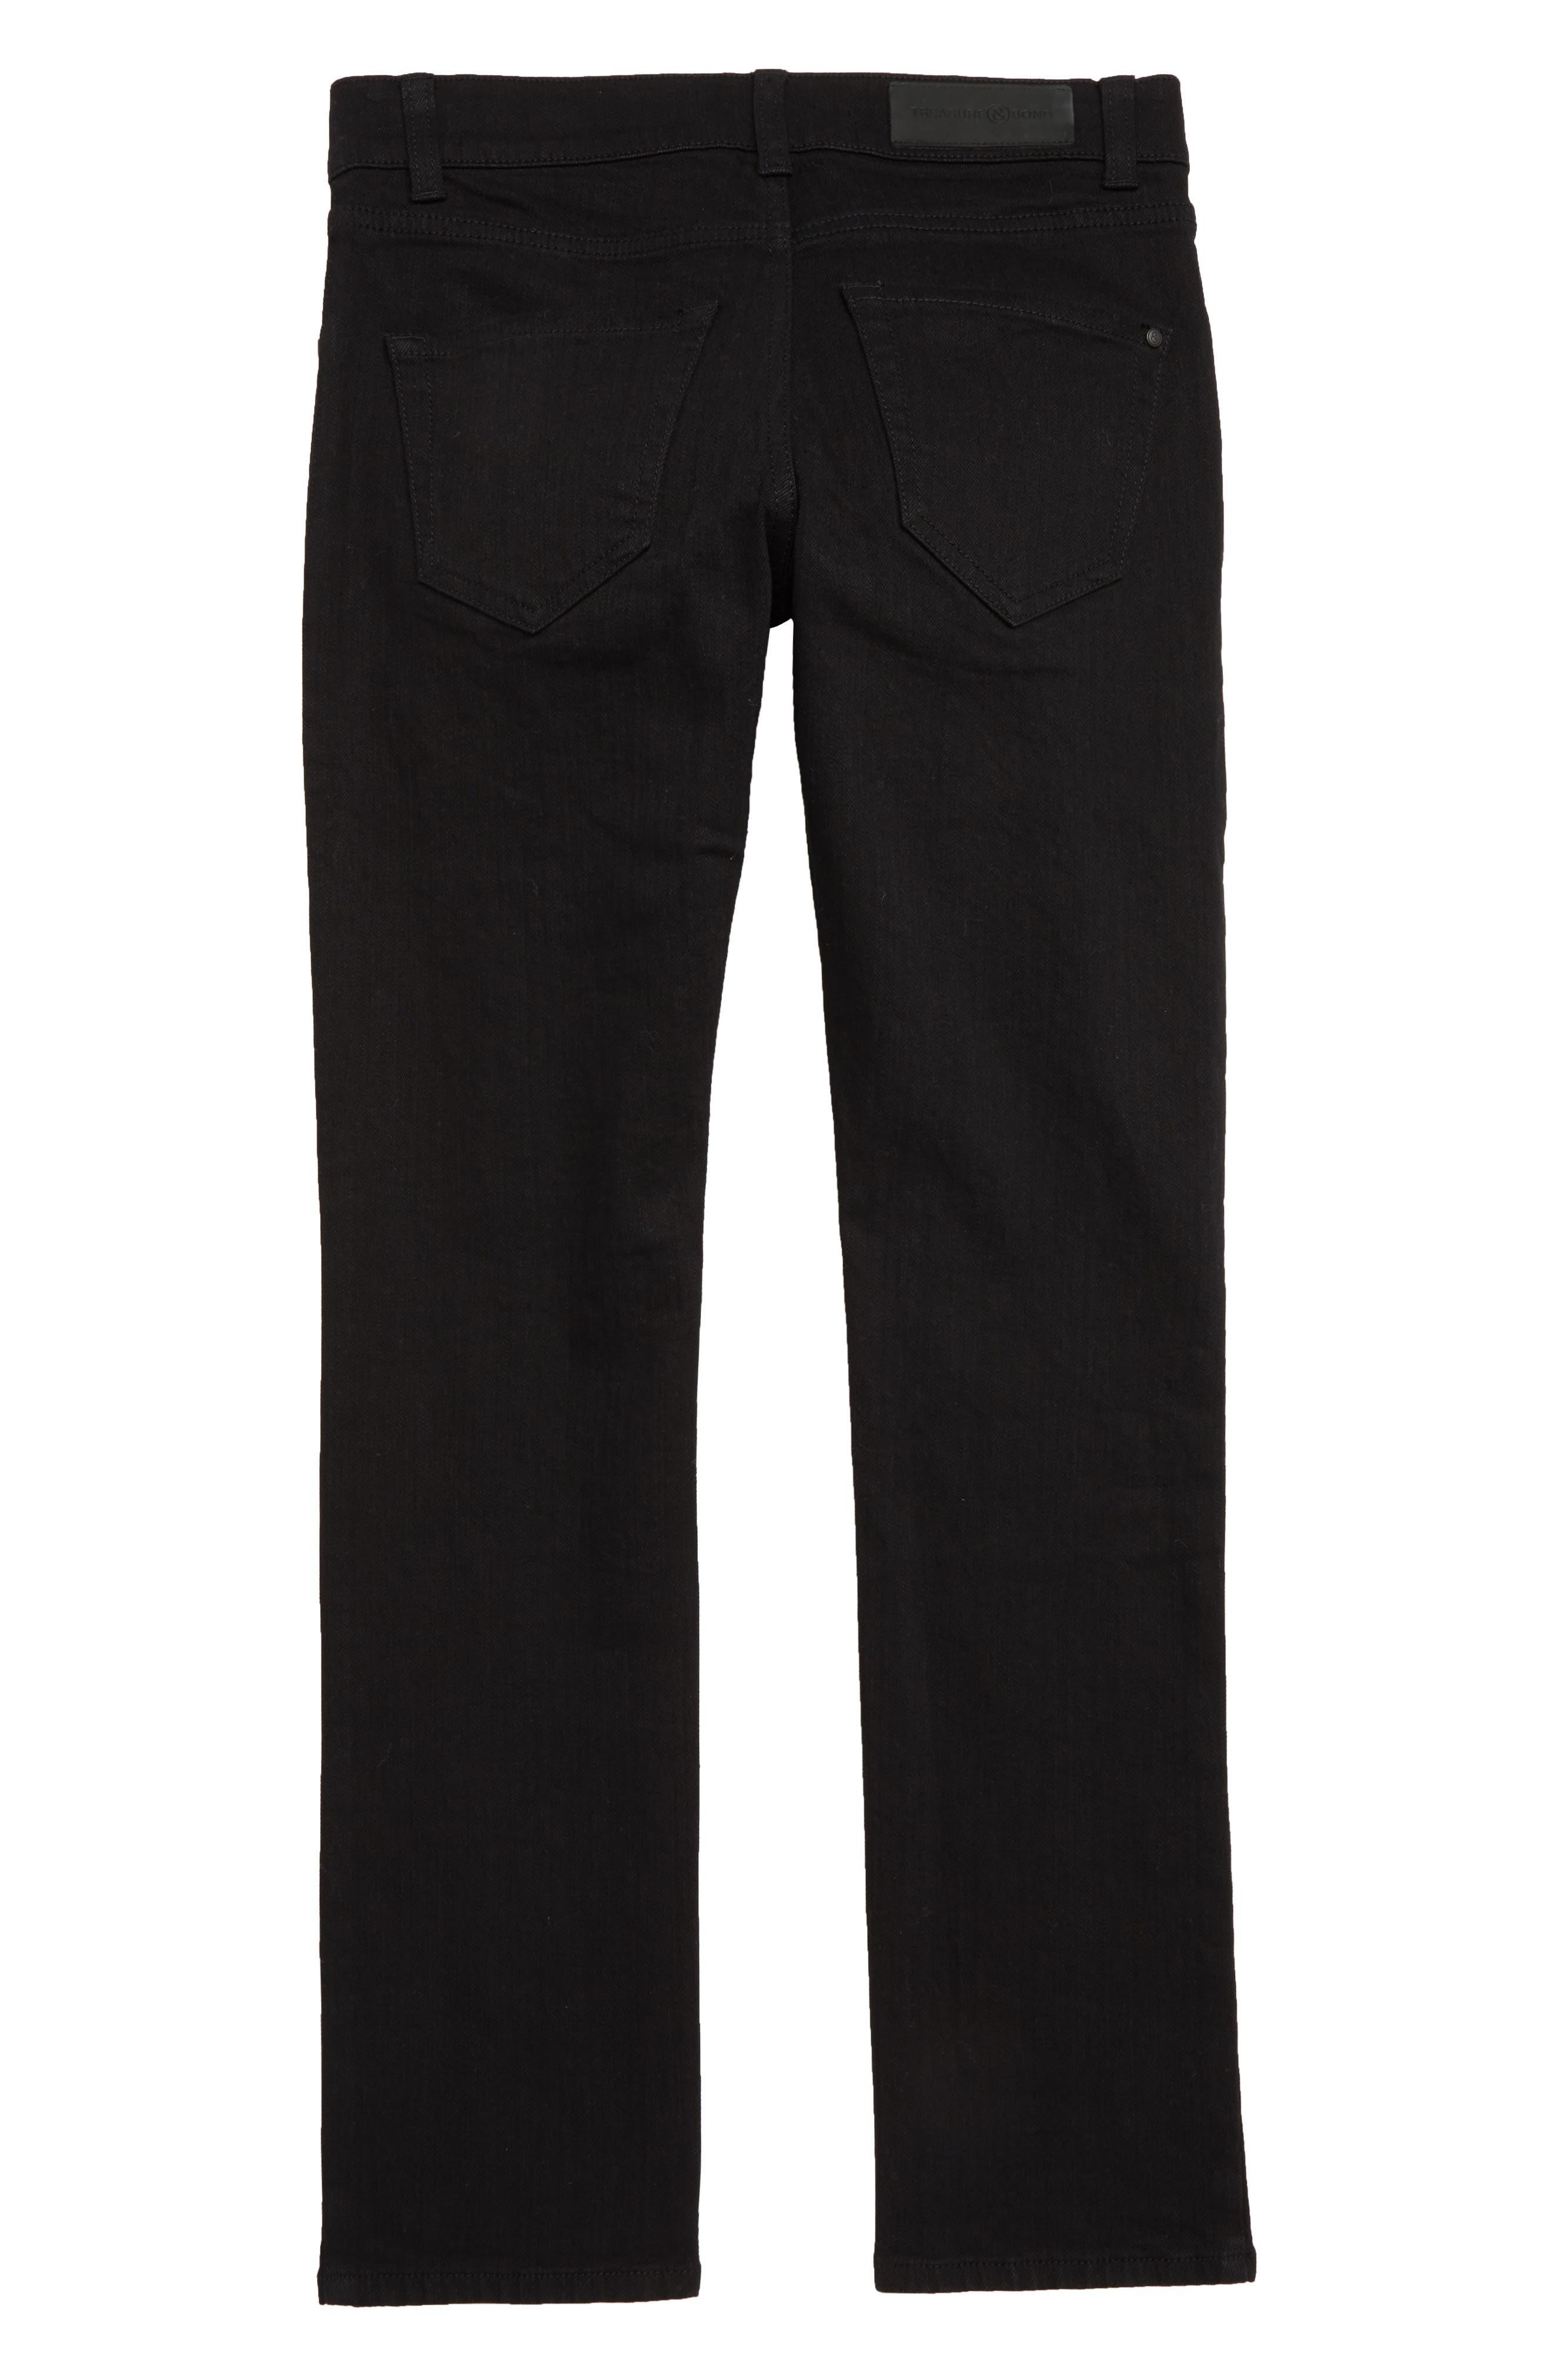 Skinny Jeans,                             Alternate thumbnail 2, color,                             EASY BLACK WASH